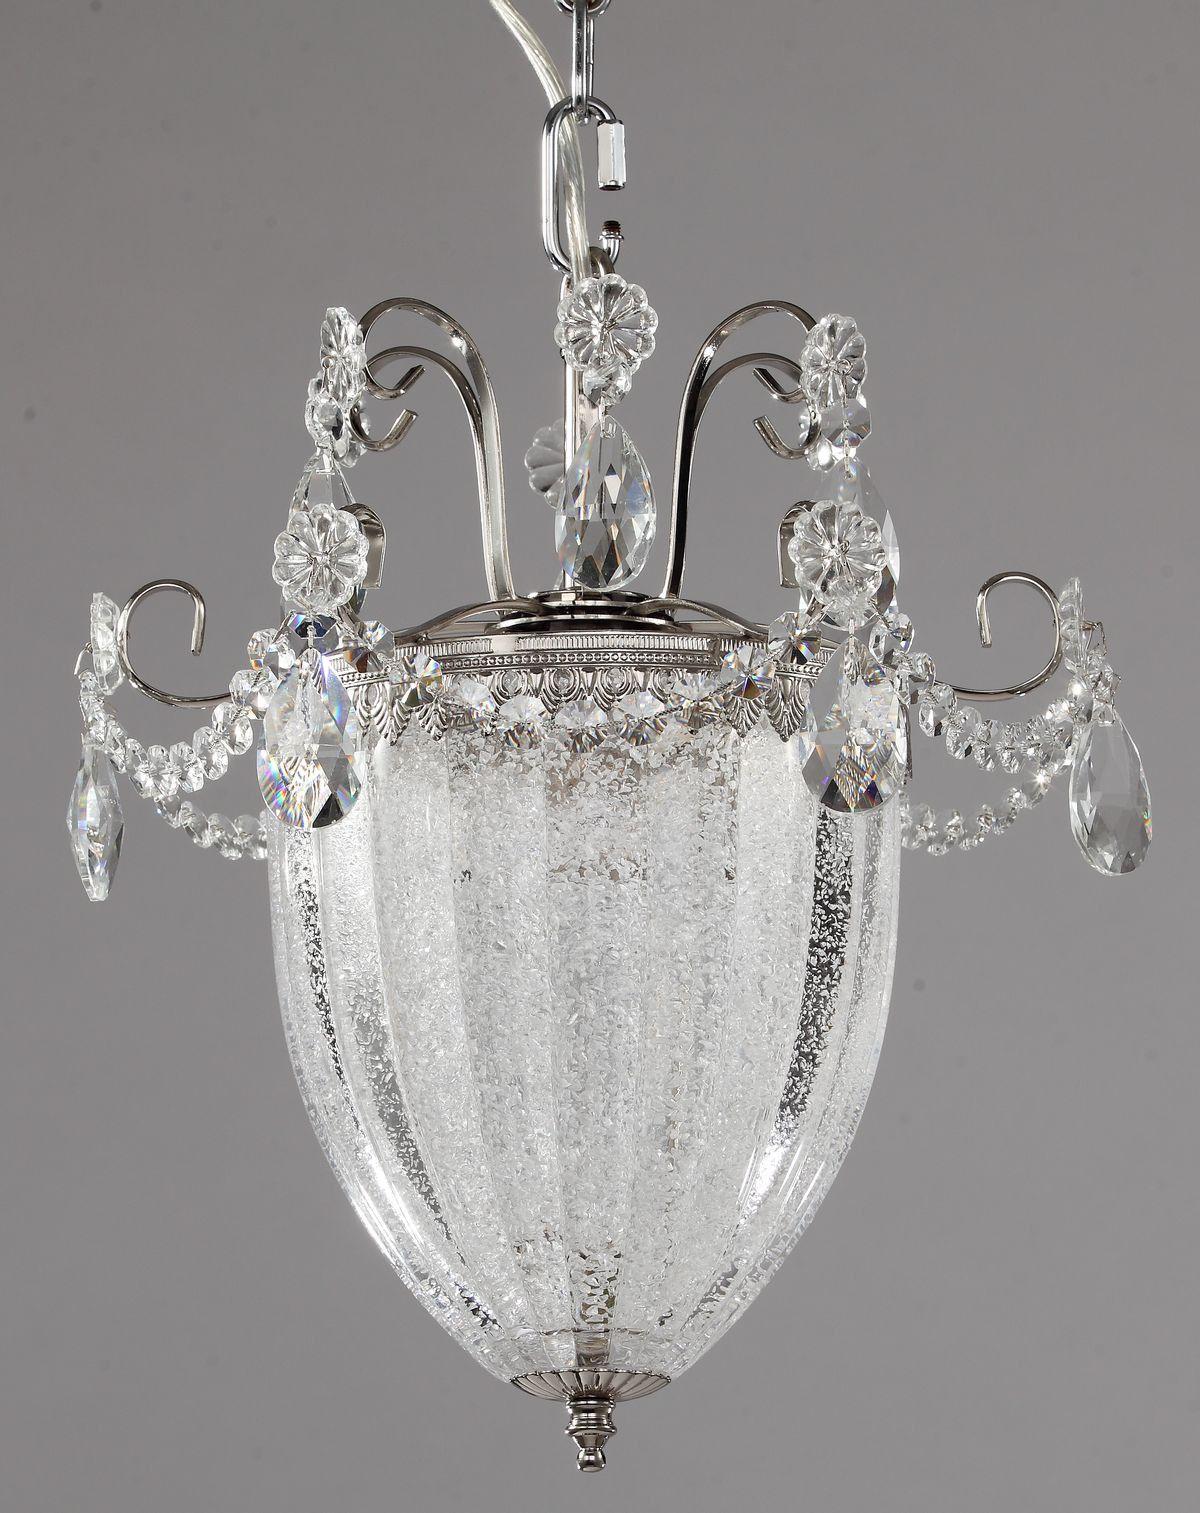 Diamant Crystal Kronleuchter Ulana Nickel Kristall Kronleuchter Leuchten Lampen Einfach Kronleuchter Kristall Kronleuchter Kronleuchter Kaufen